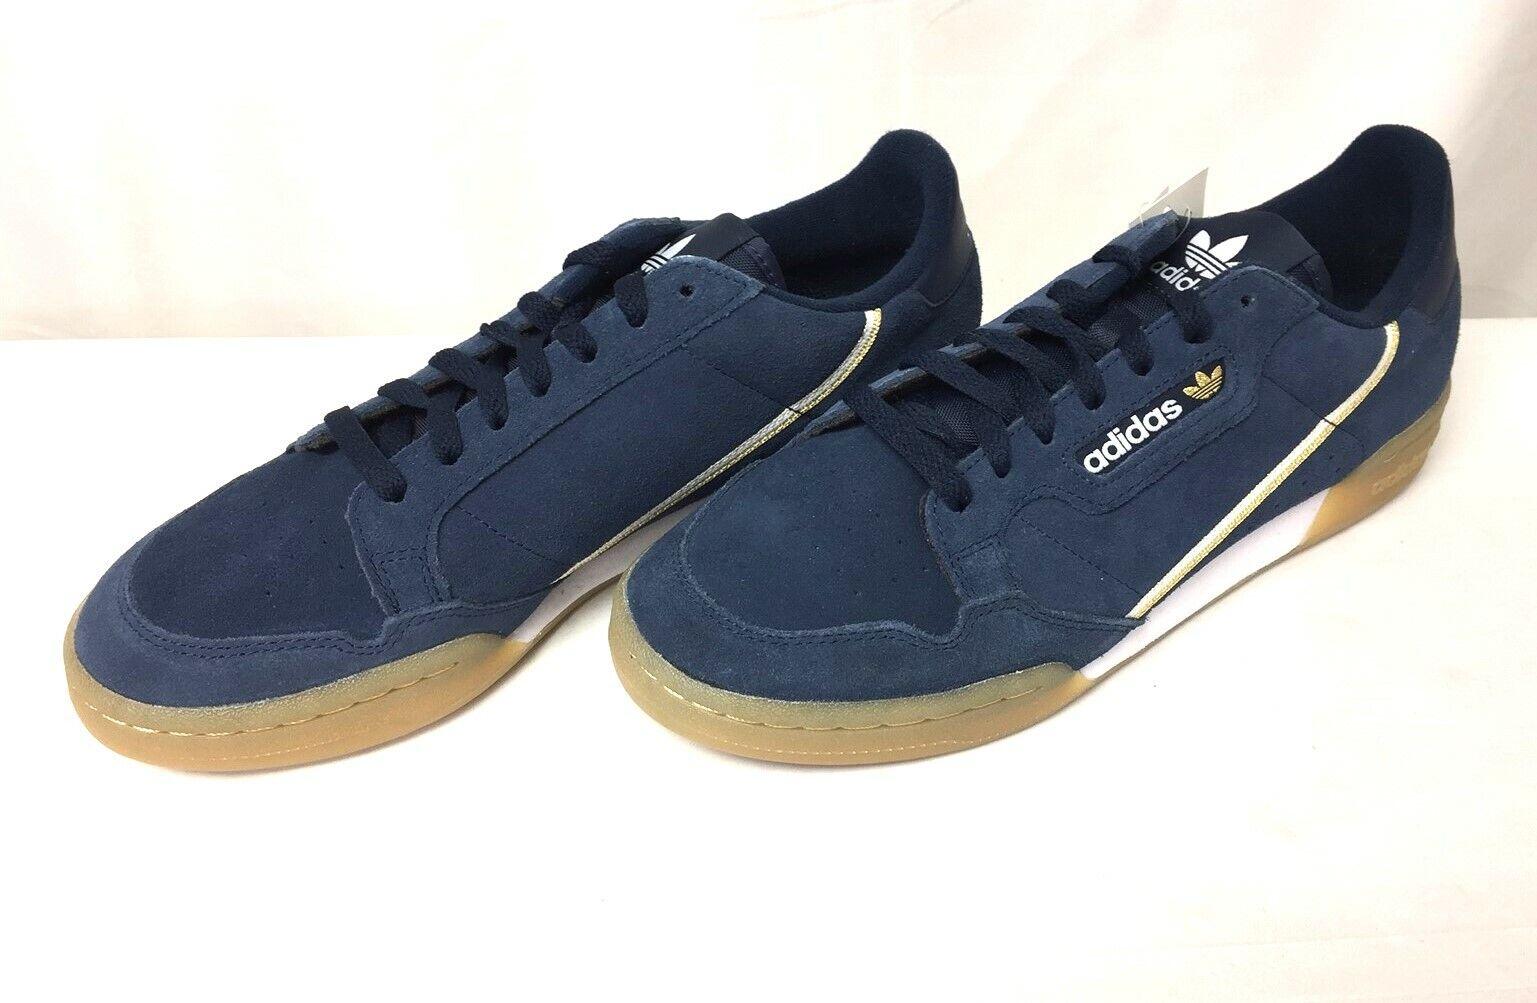 Adidas Men's Continental 80 Fashion Sneaker, Men's 9.5, CG6537, New Unworn